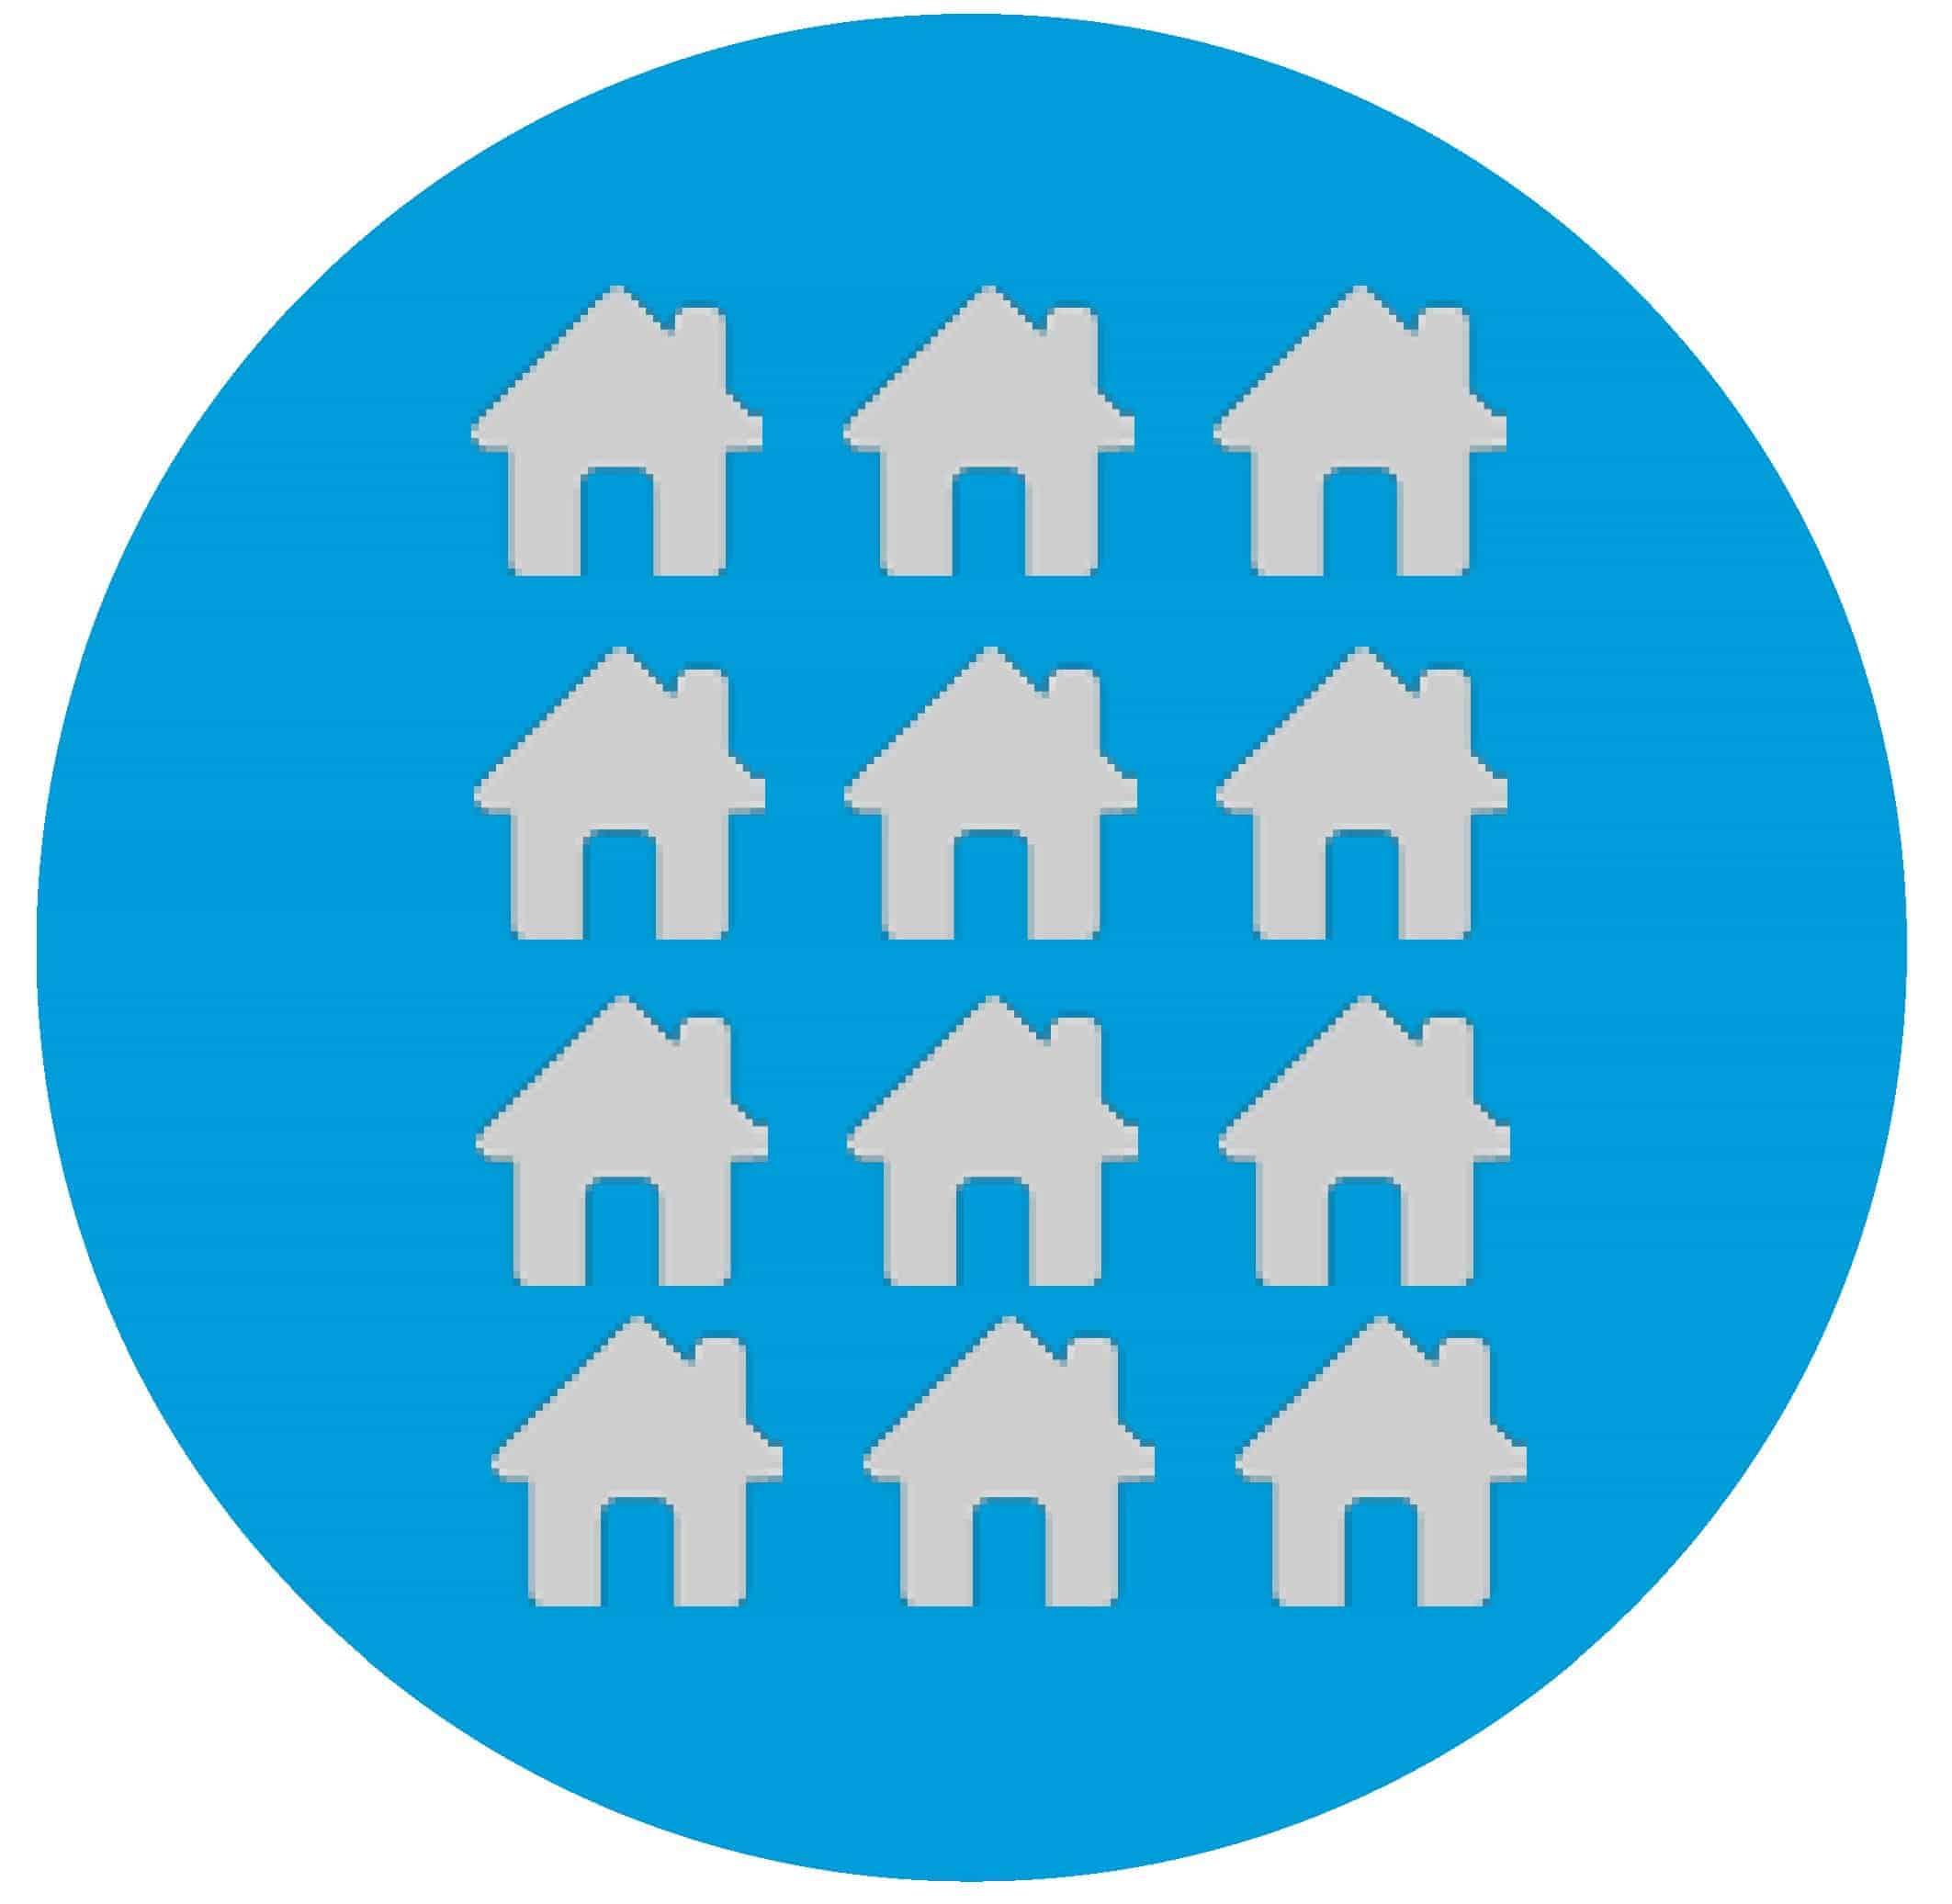 Houses representing new addresses